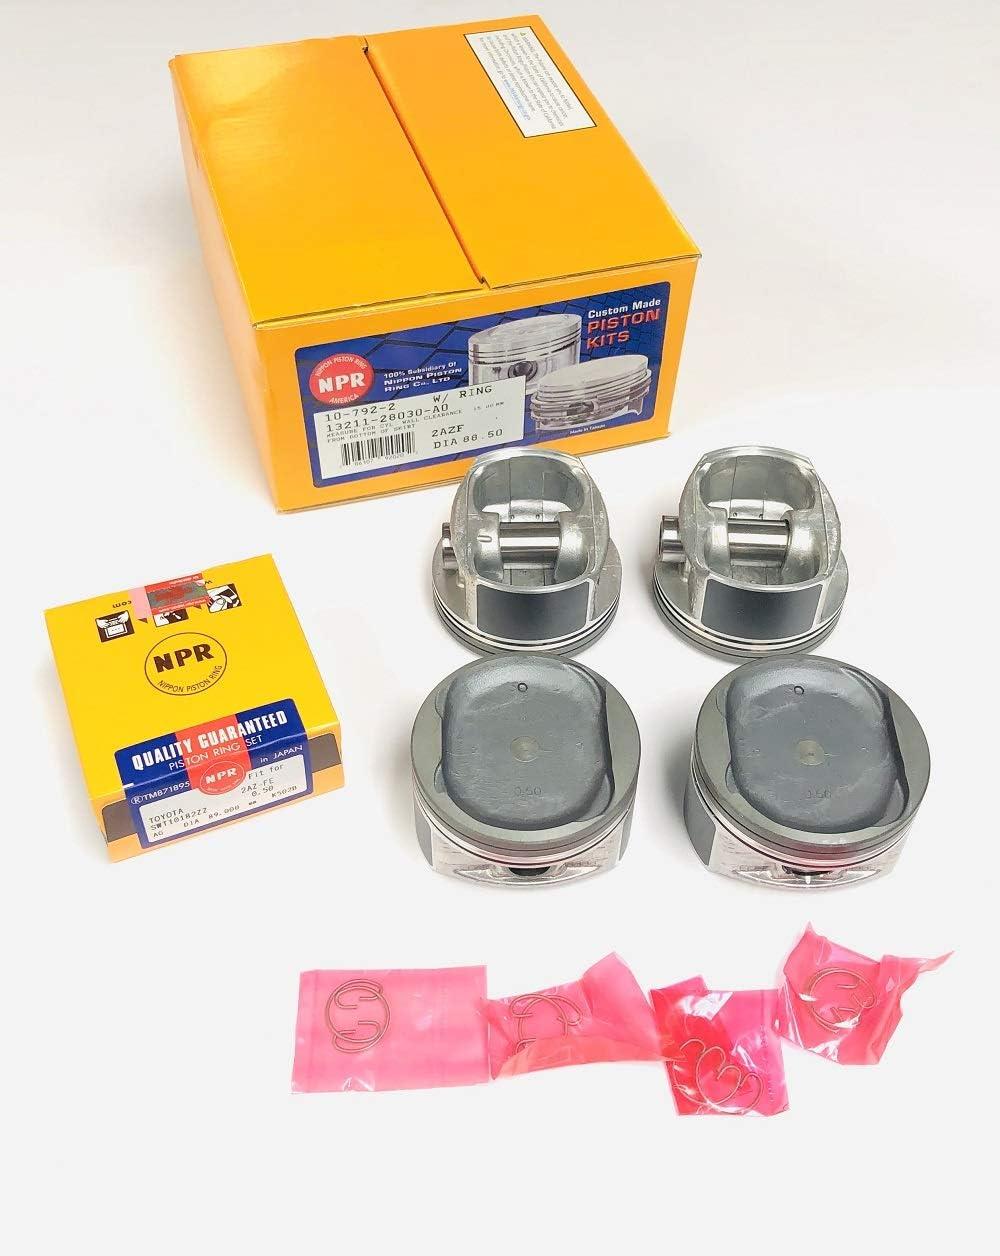 Pistons+Rings Set compatible with 2001-2006 Toyota 2.4L DOHC 2AZFE 88.50mm Bore Camry Solara Rav-4